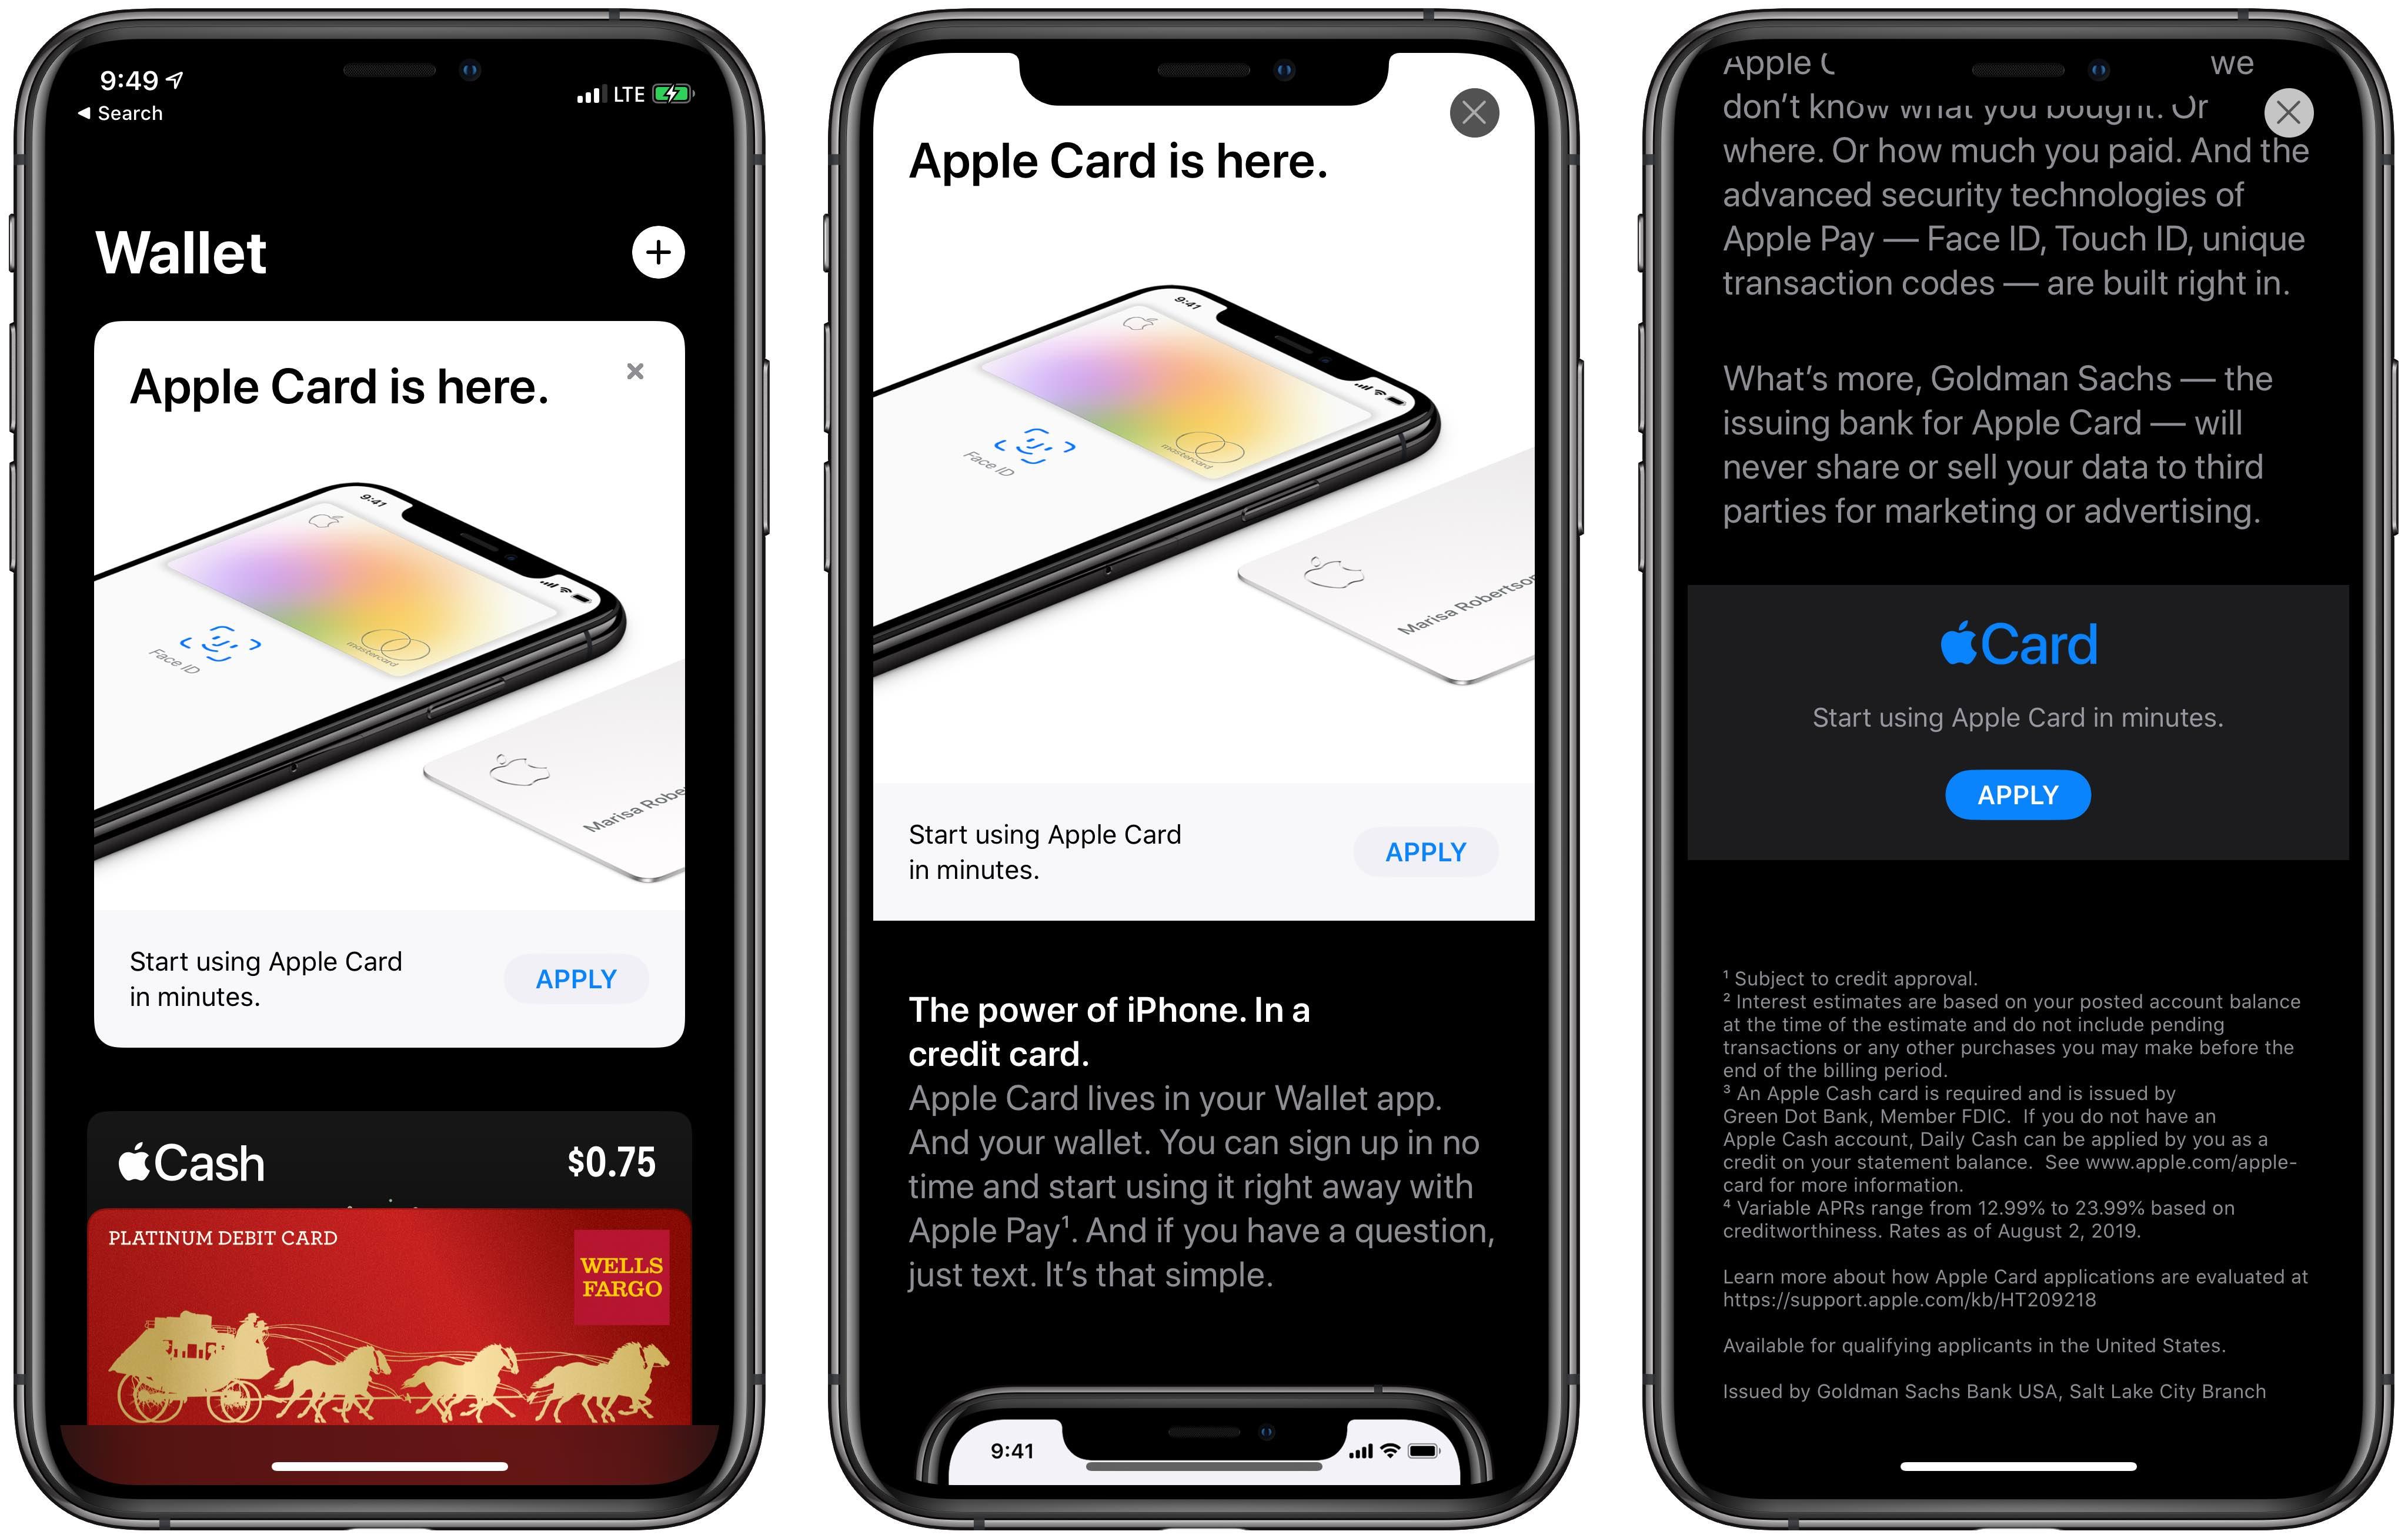 Apple promoting Apple Card in Wallet app